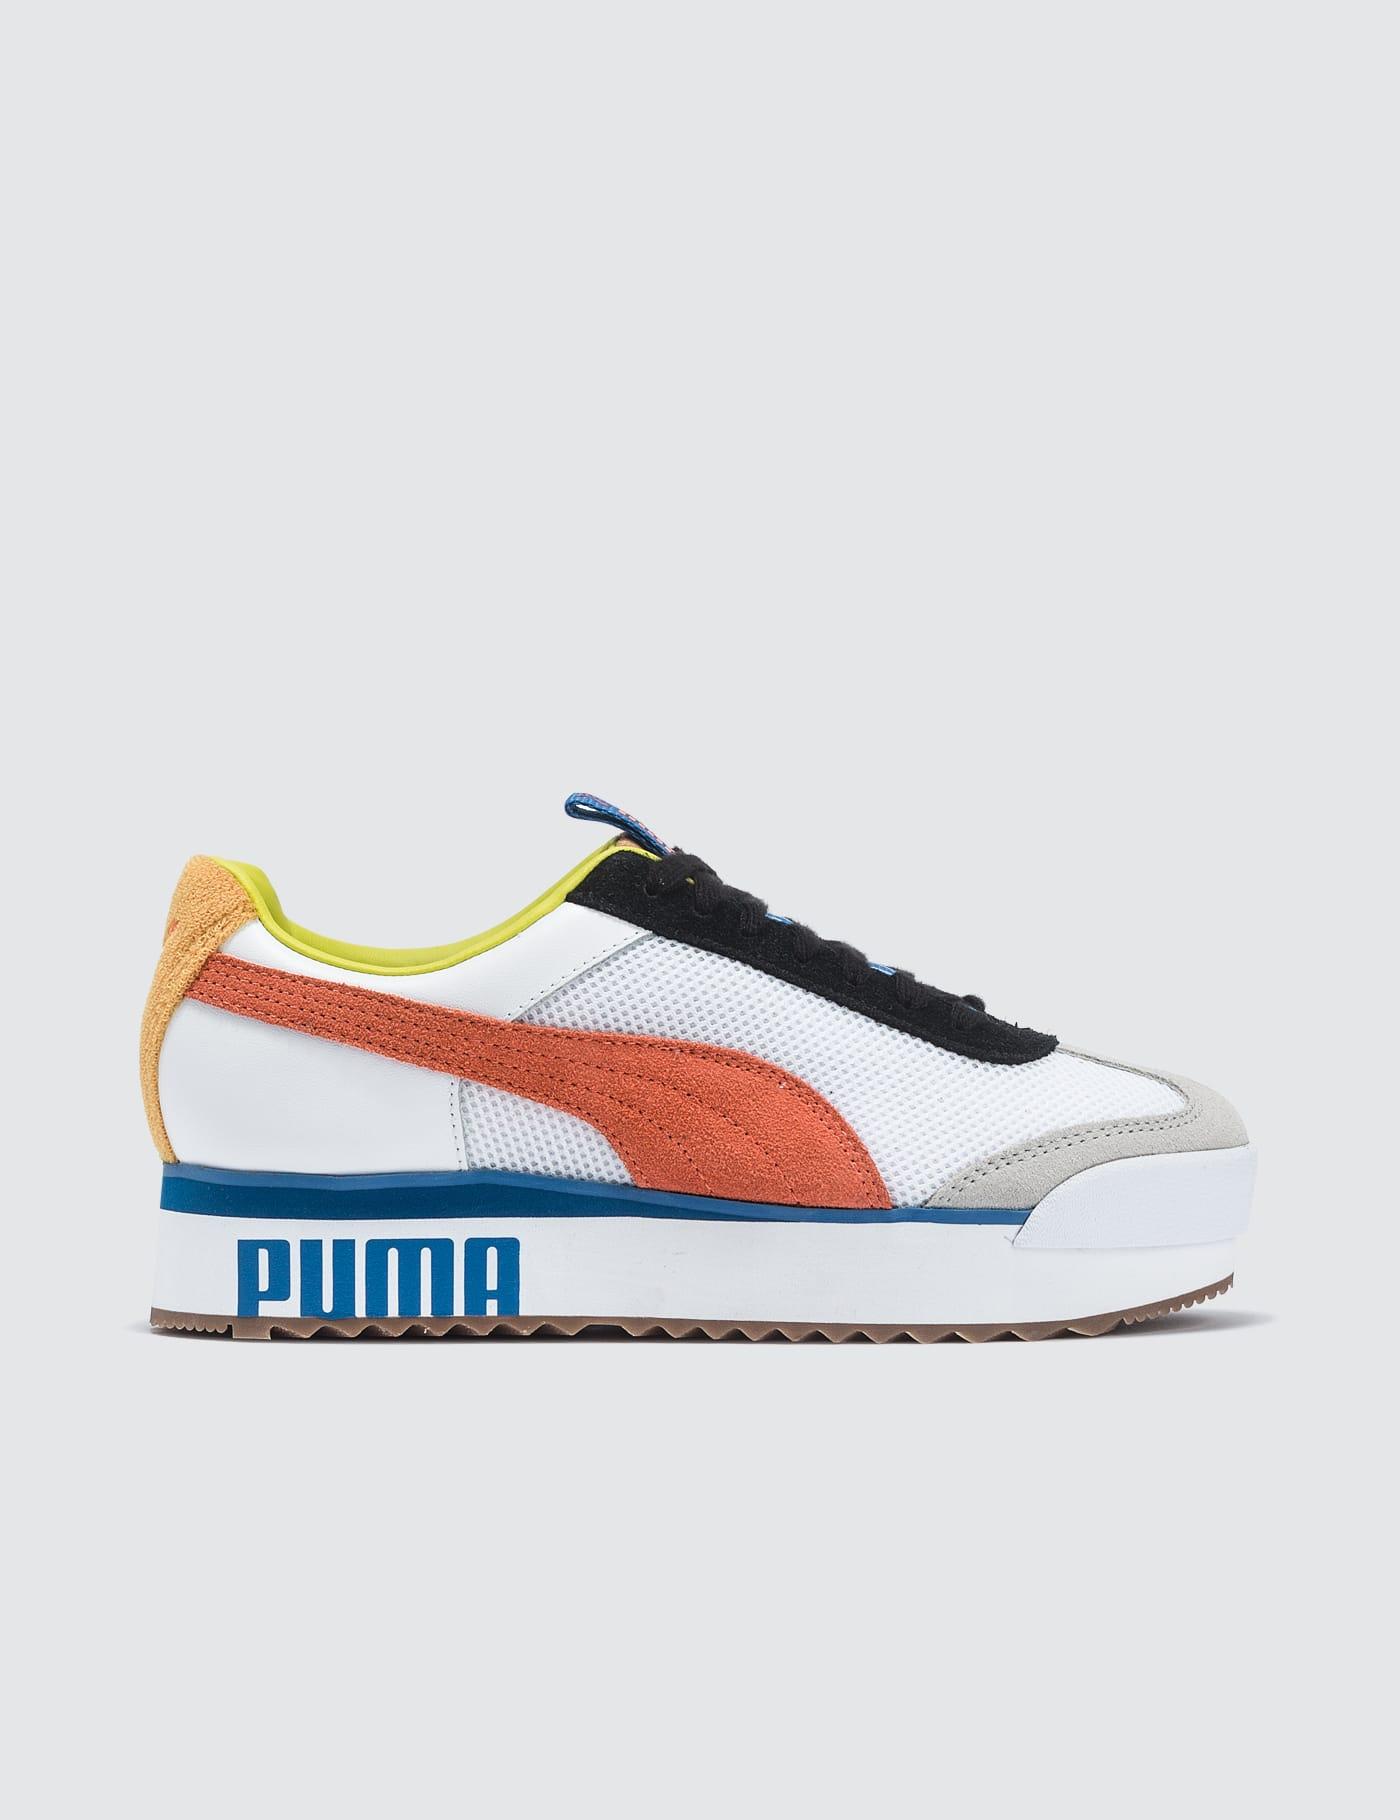 Puma - Roma Amor Sport | HBX